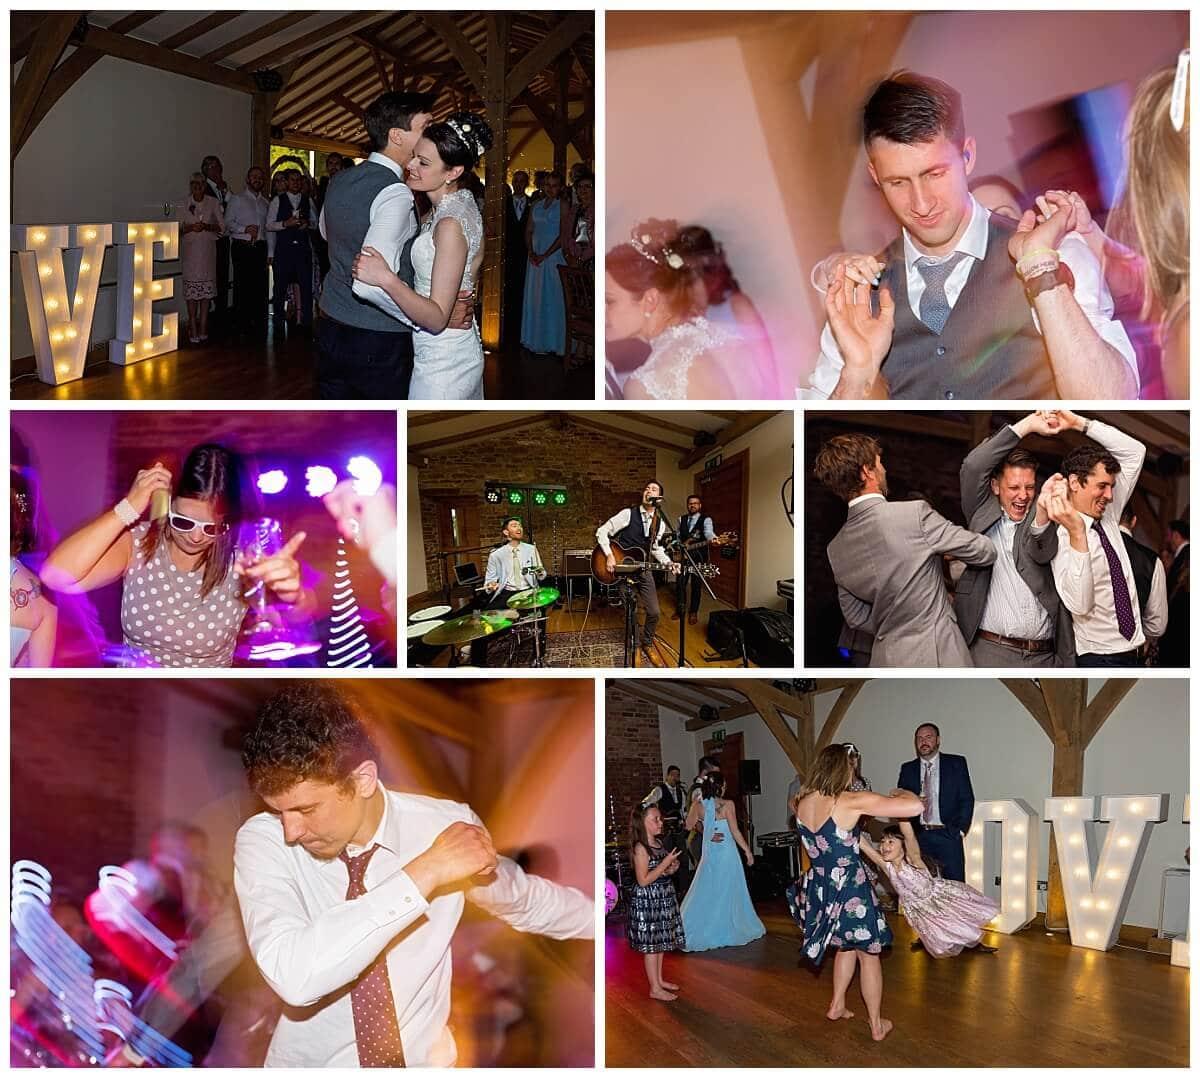 Wedding Band and dancing